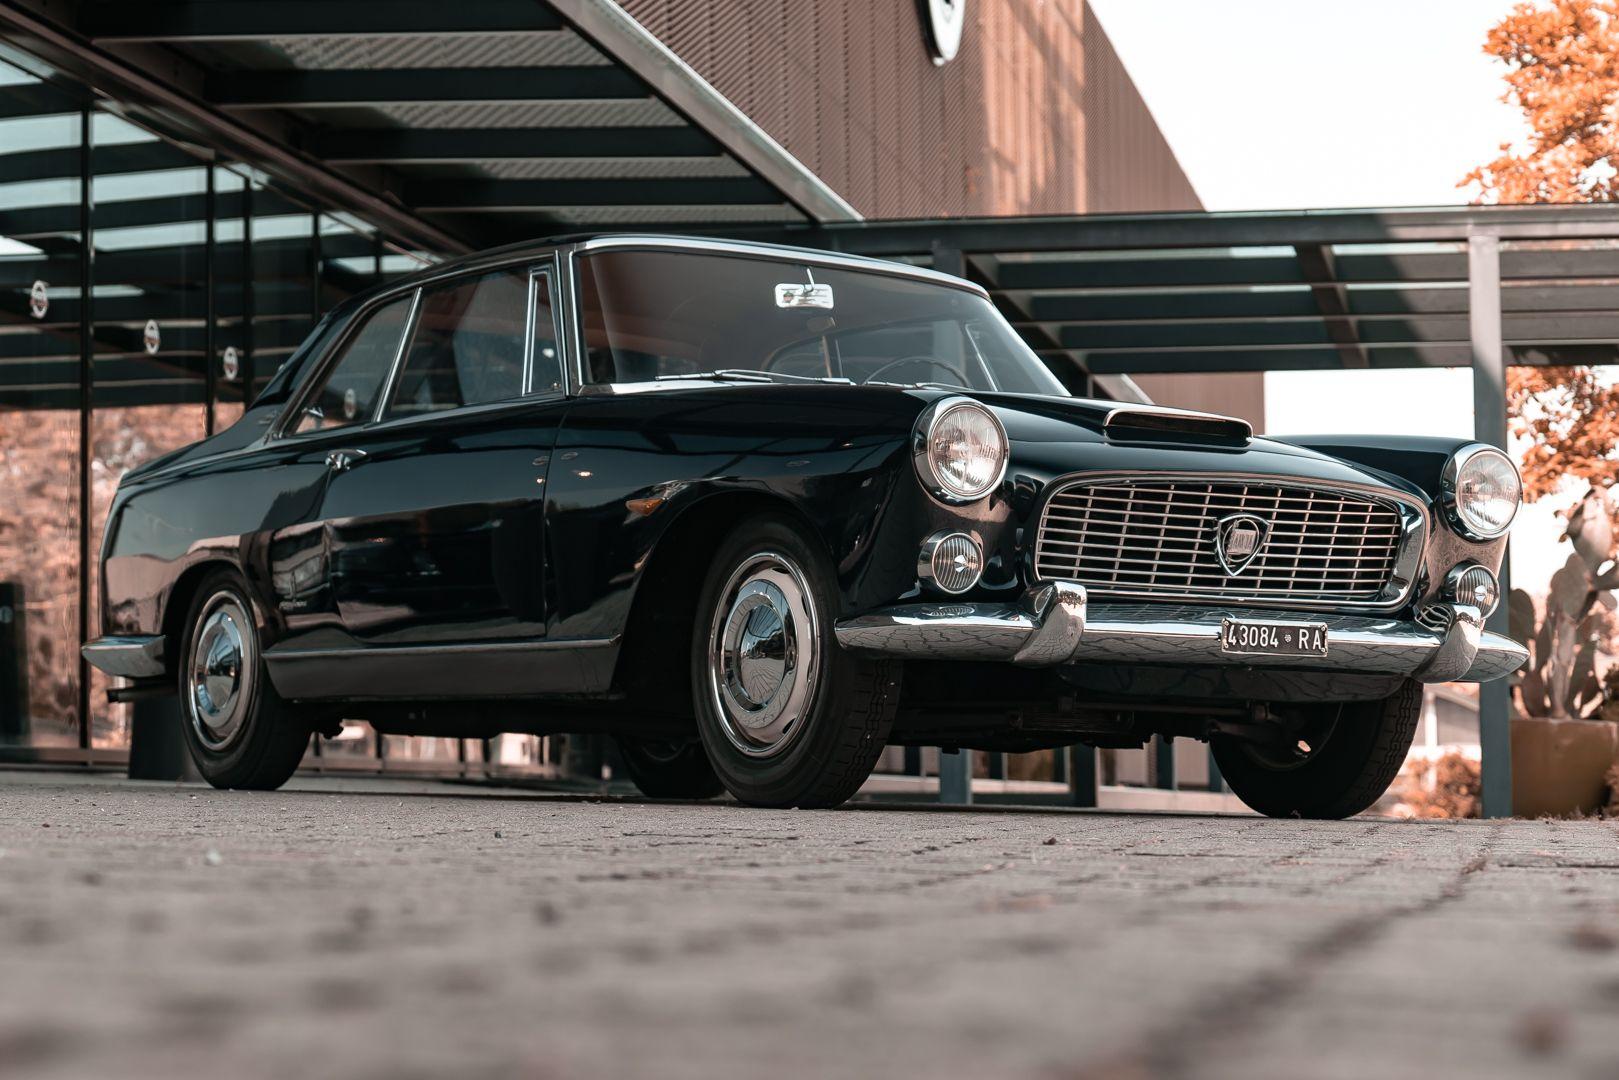 1960 Lancia Flaminia Coupé Pininfarina 2.5 76029